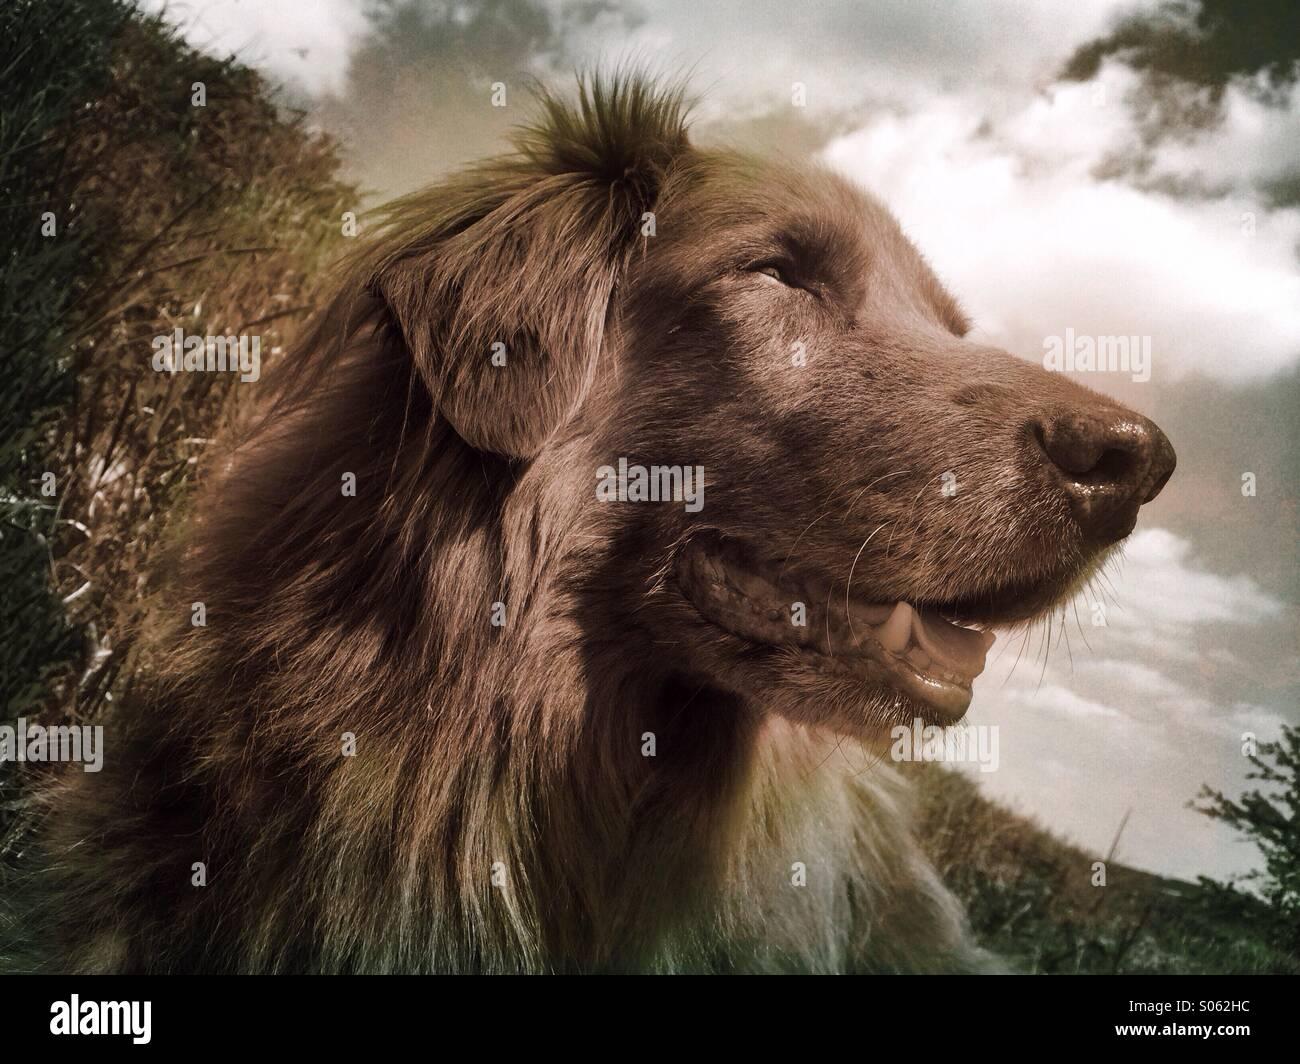 Old male dog - Stock Image